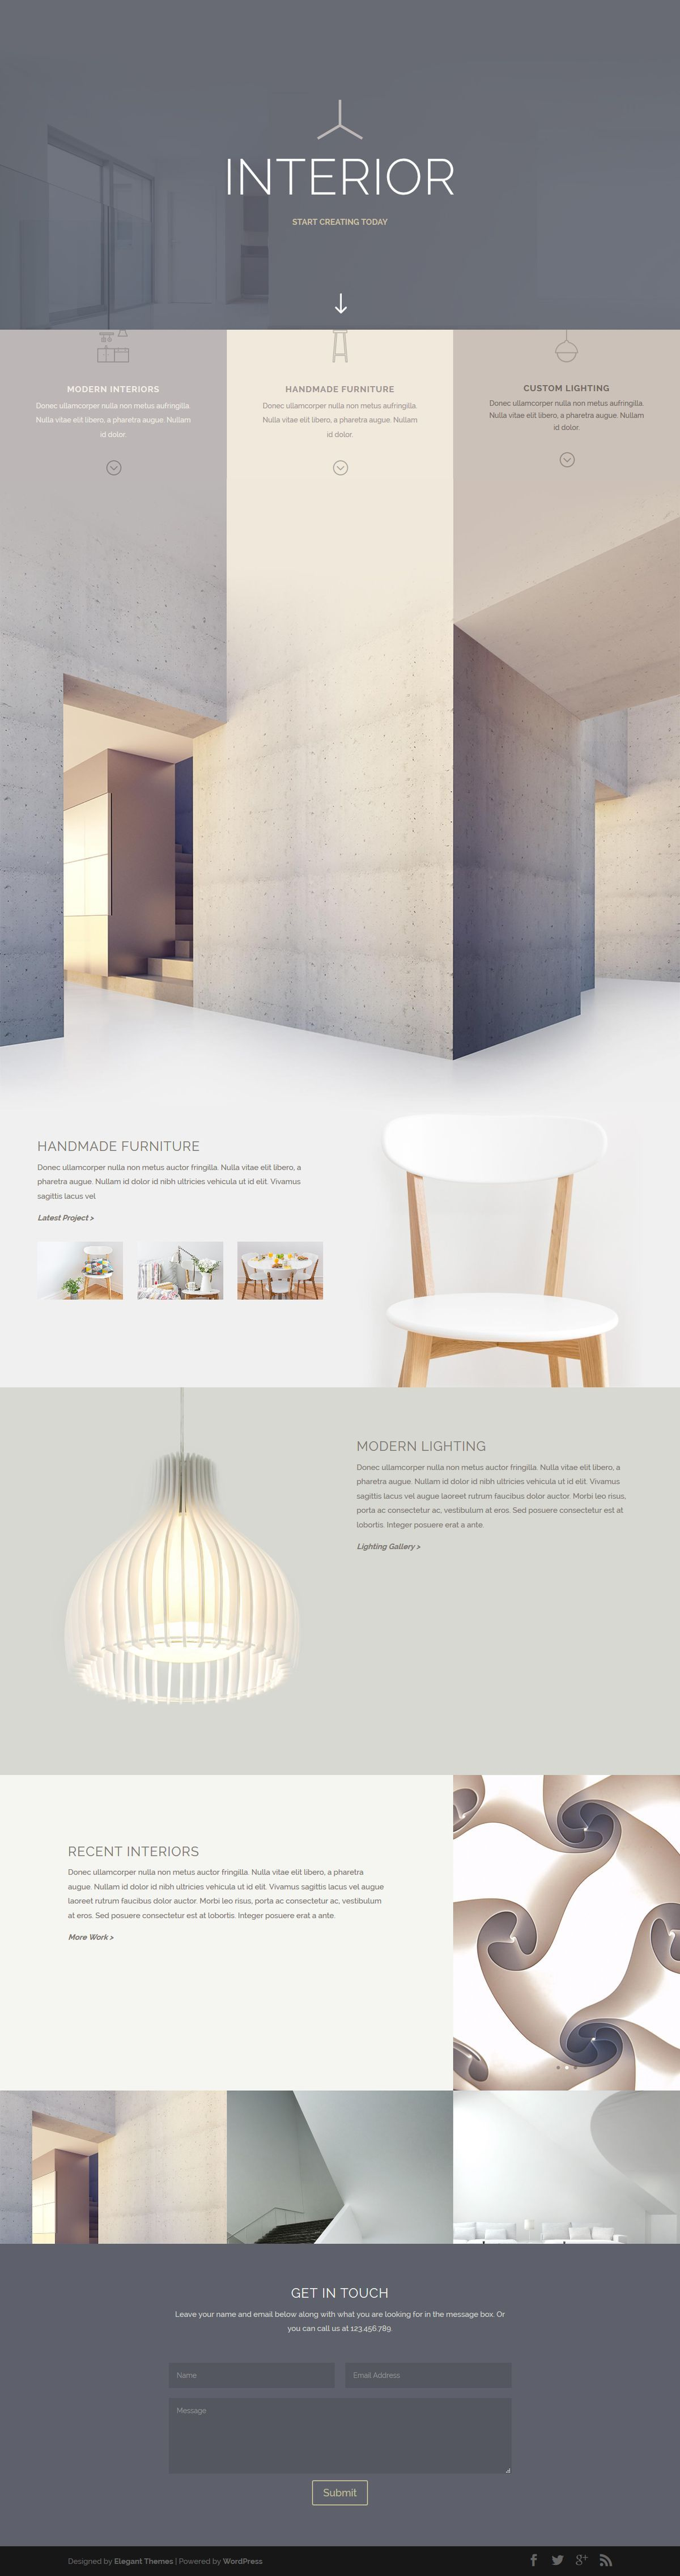 Premium Photography Wordpress Design  -  #wordpressdeign #wordpressthemes #wordpresstemplates